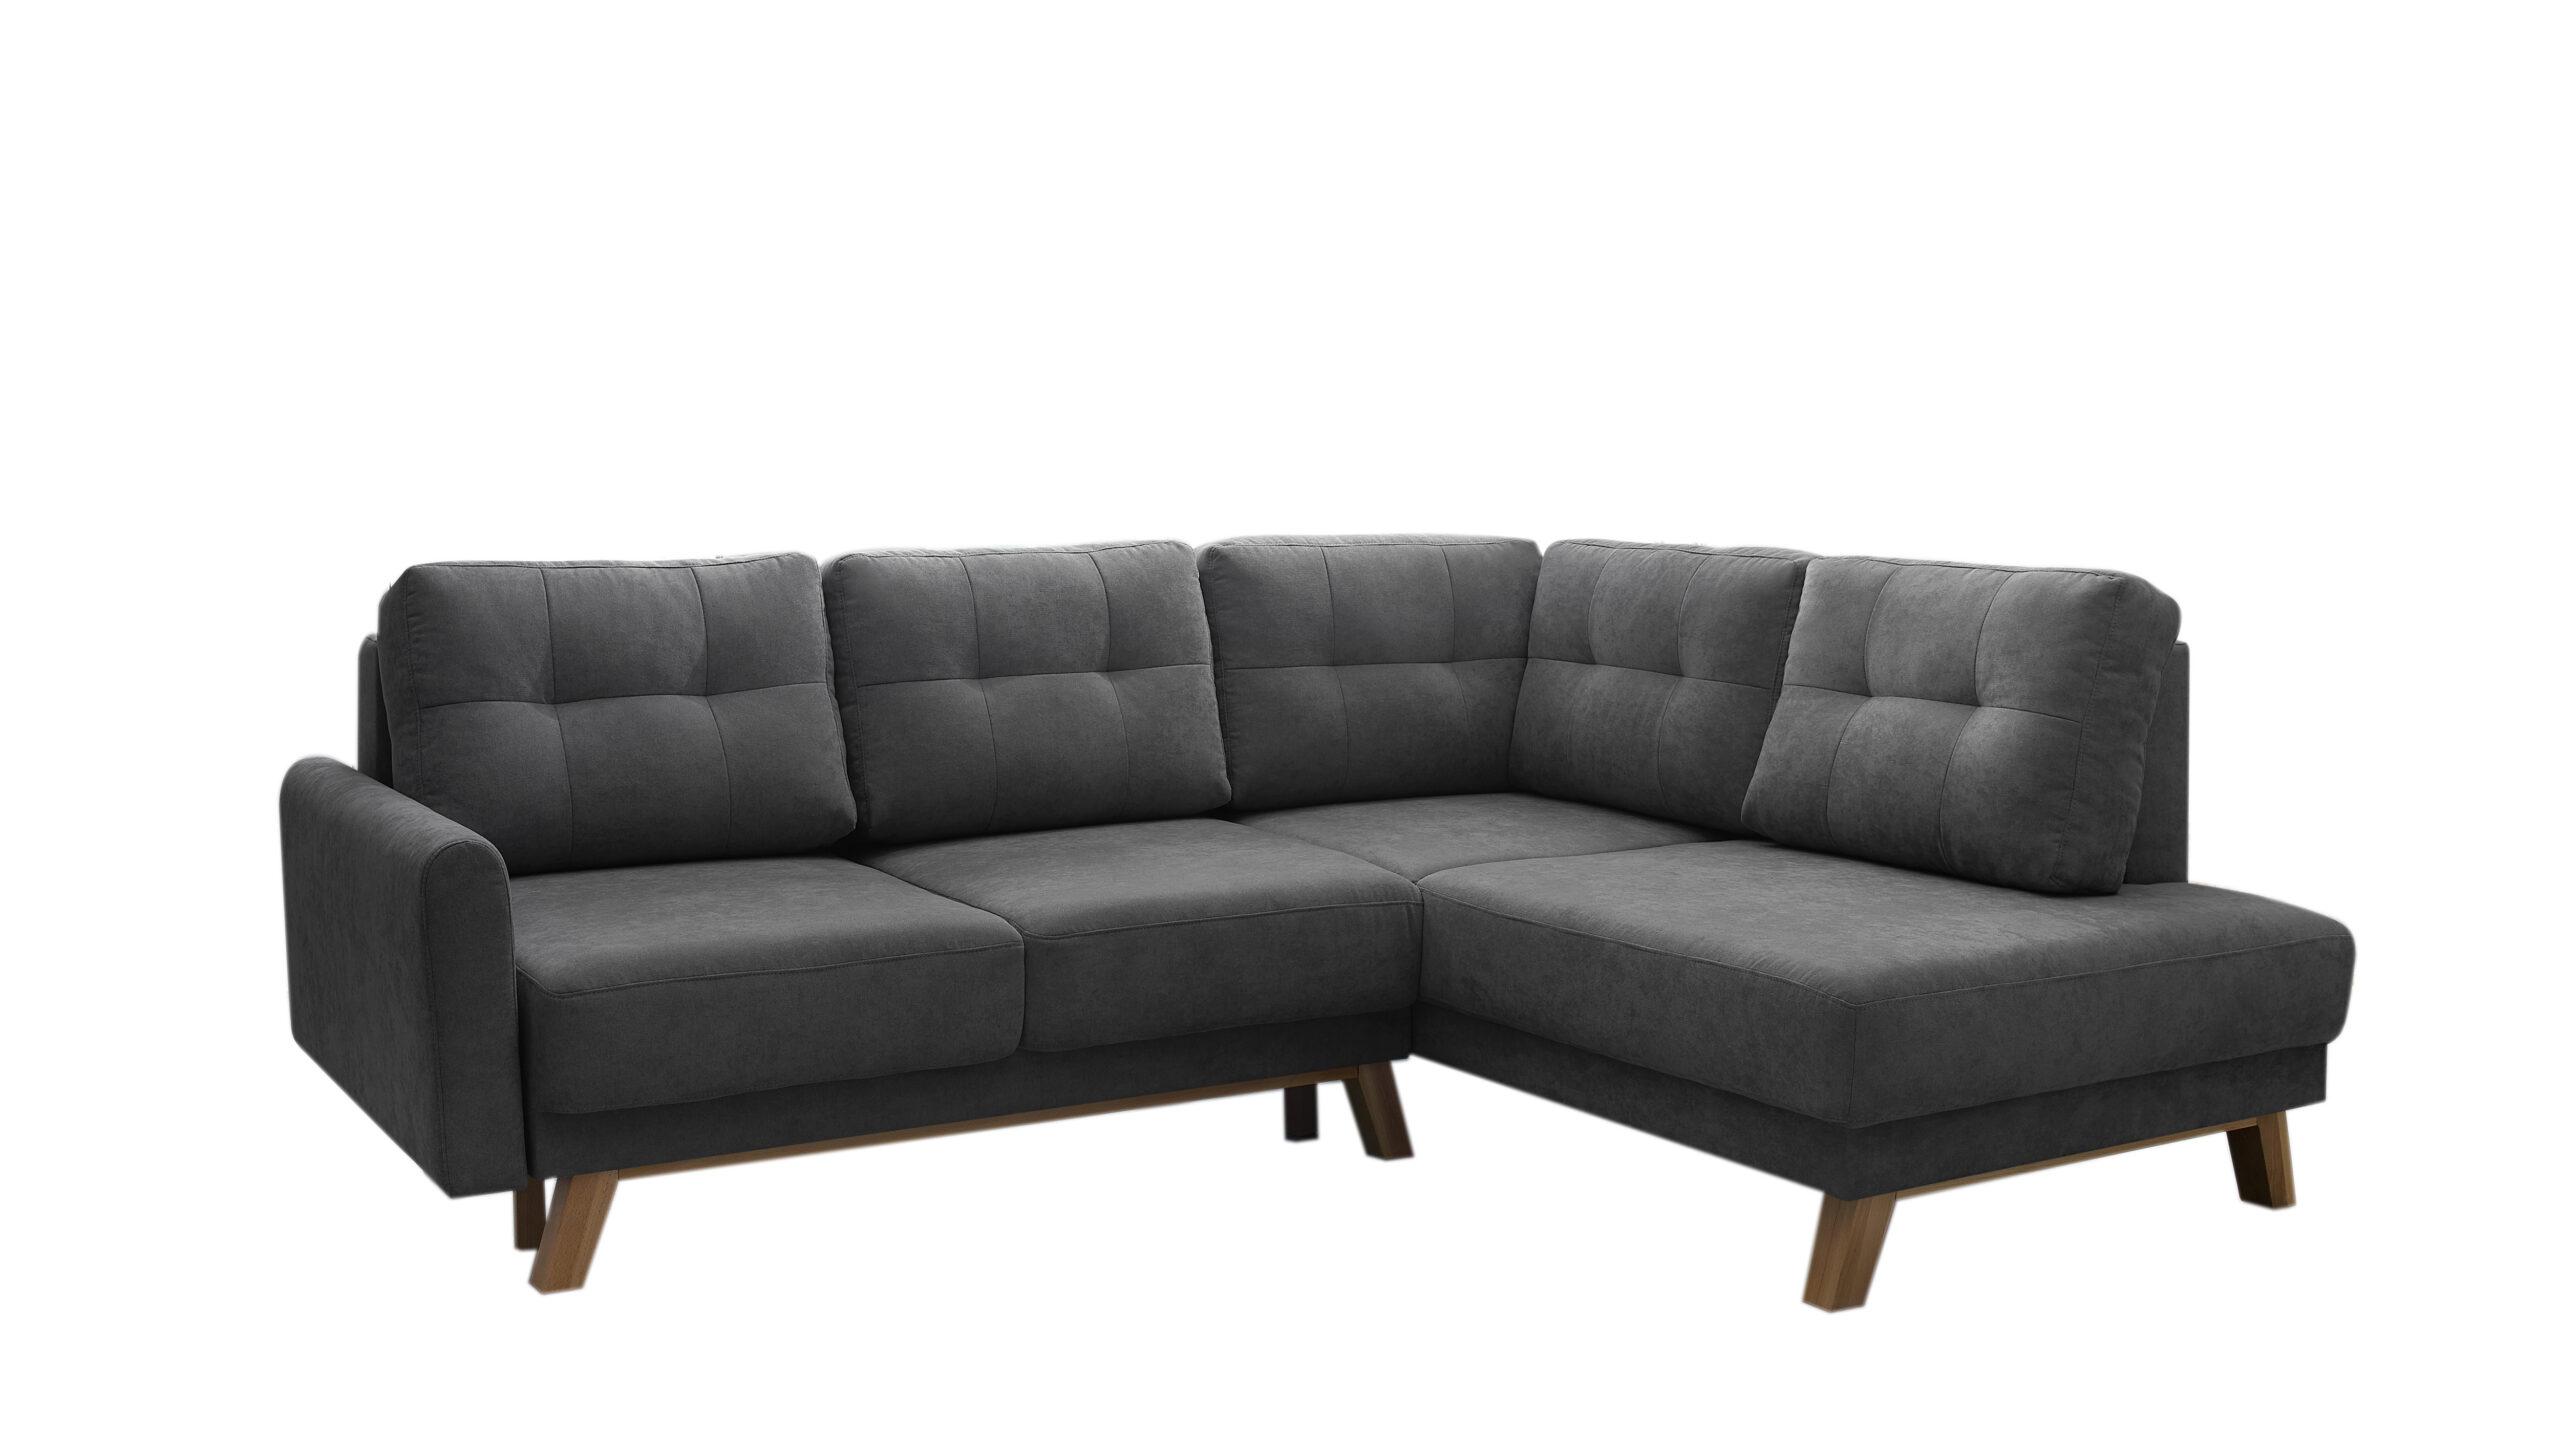 Full Size of Canape Sofa Kolonialstil überzug Gelb Büffelleder Franz Fertig Brühl Rundes Auf Raten Hocker Kunstleder Sofa Canape Sofa